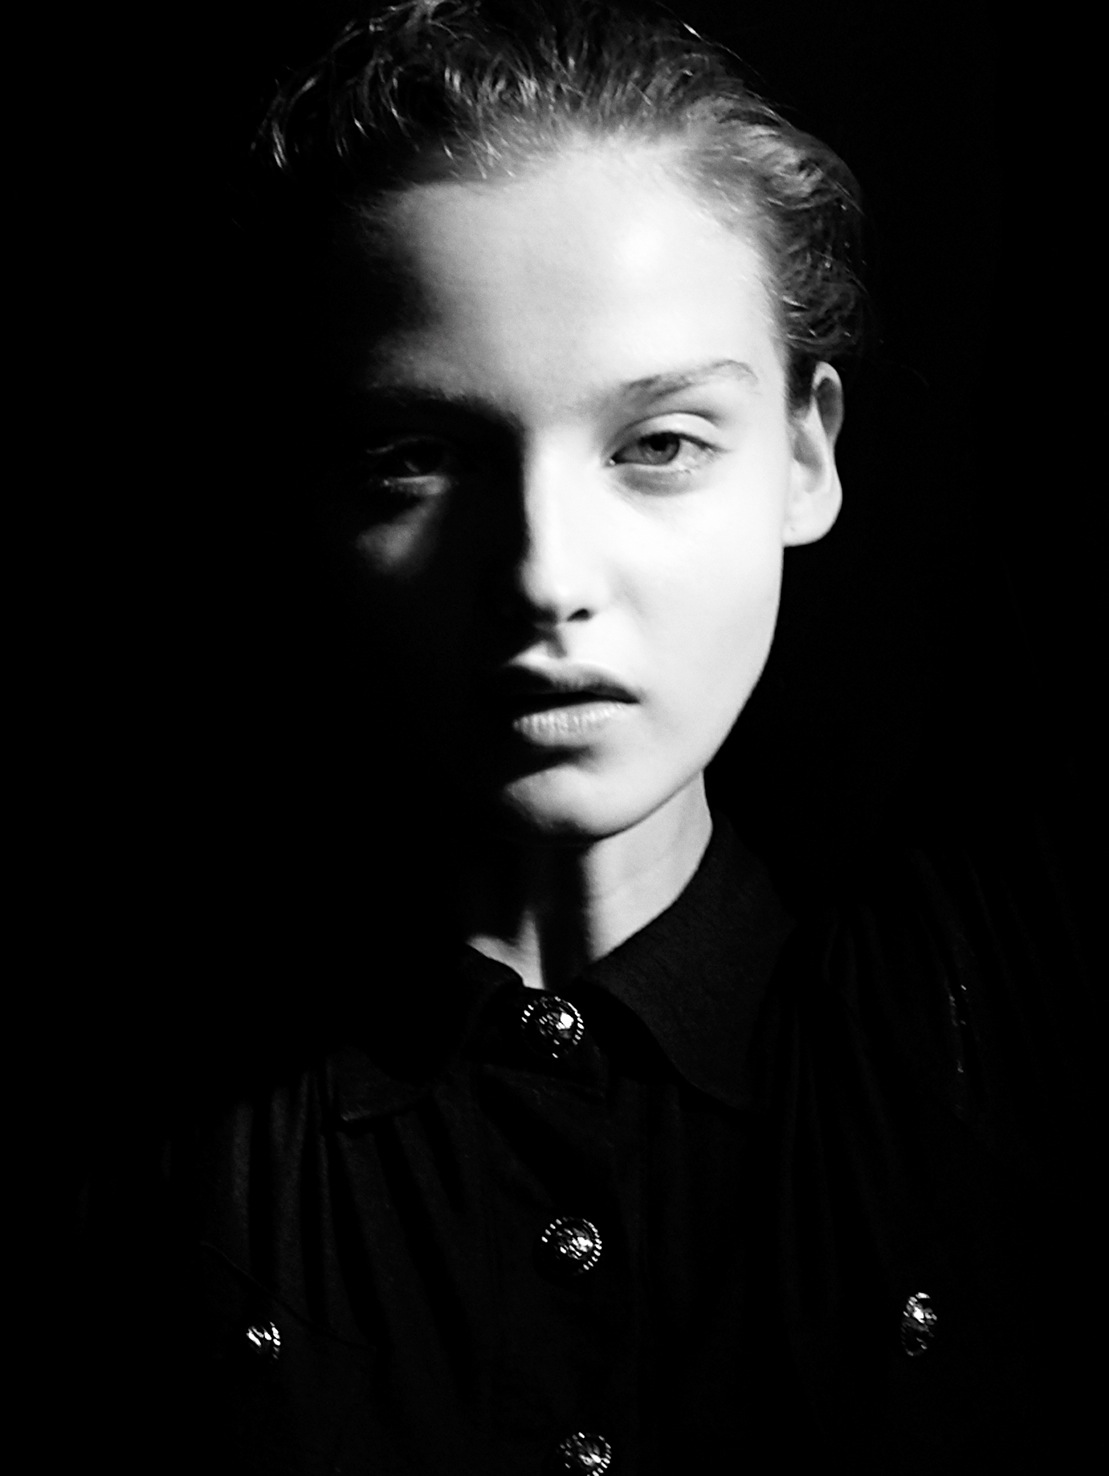 Amanda Nørgaard by <b>Eric Guillemain</b> - Amanda_Nrgaard-Eric_Guillemain-2